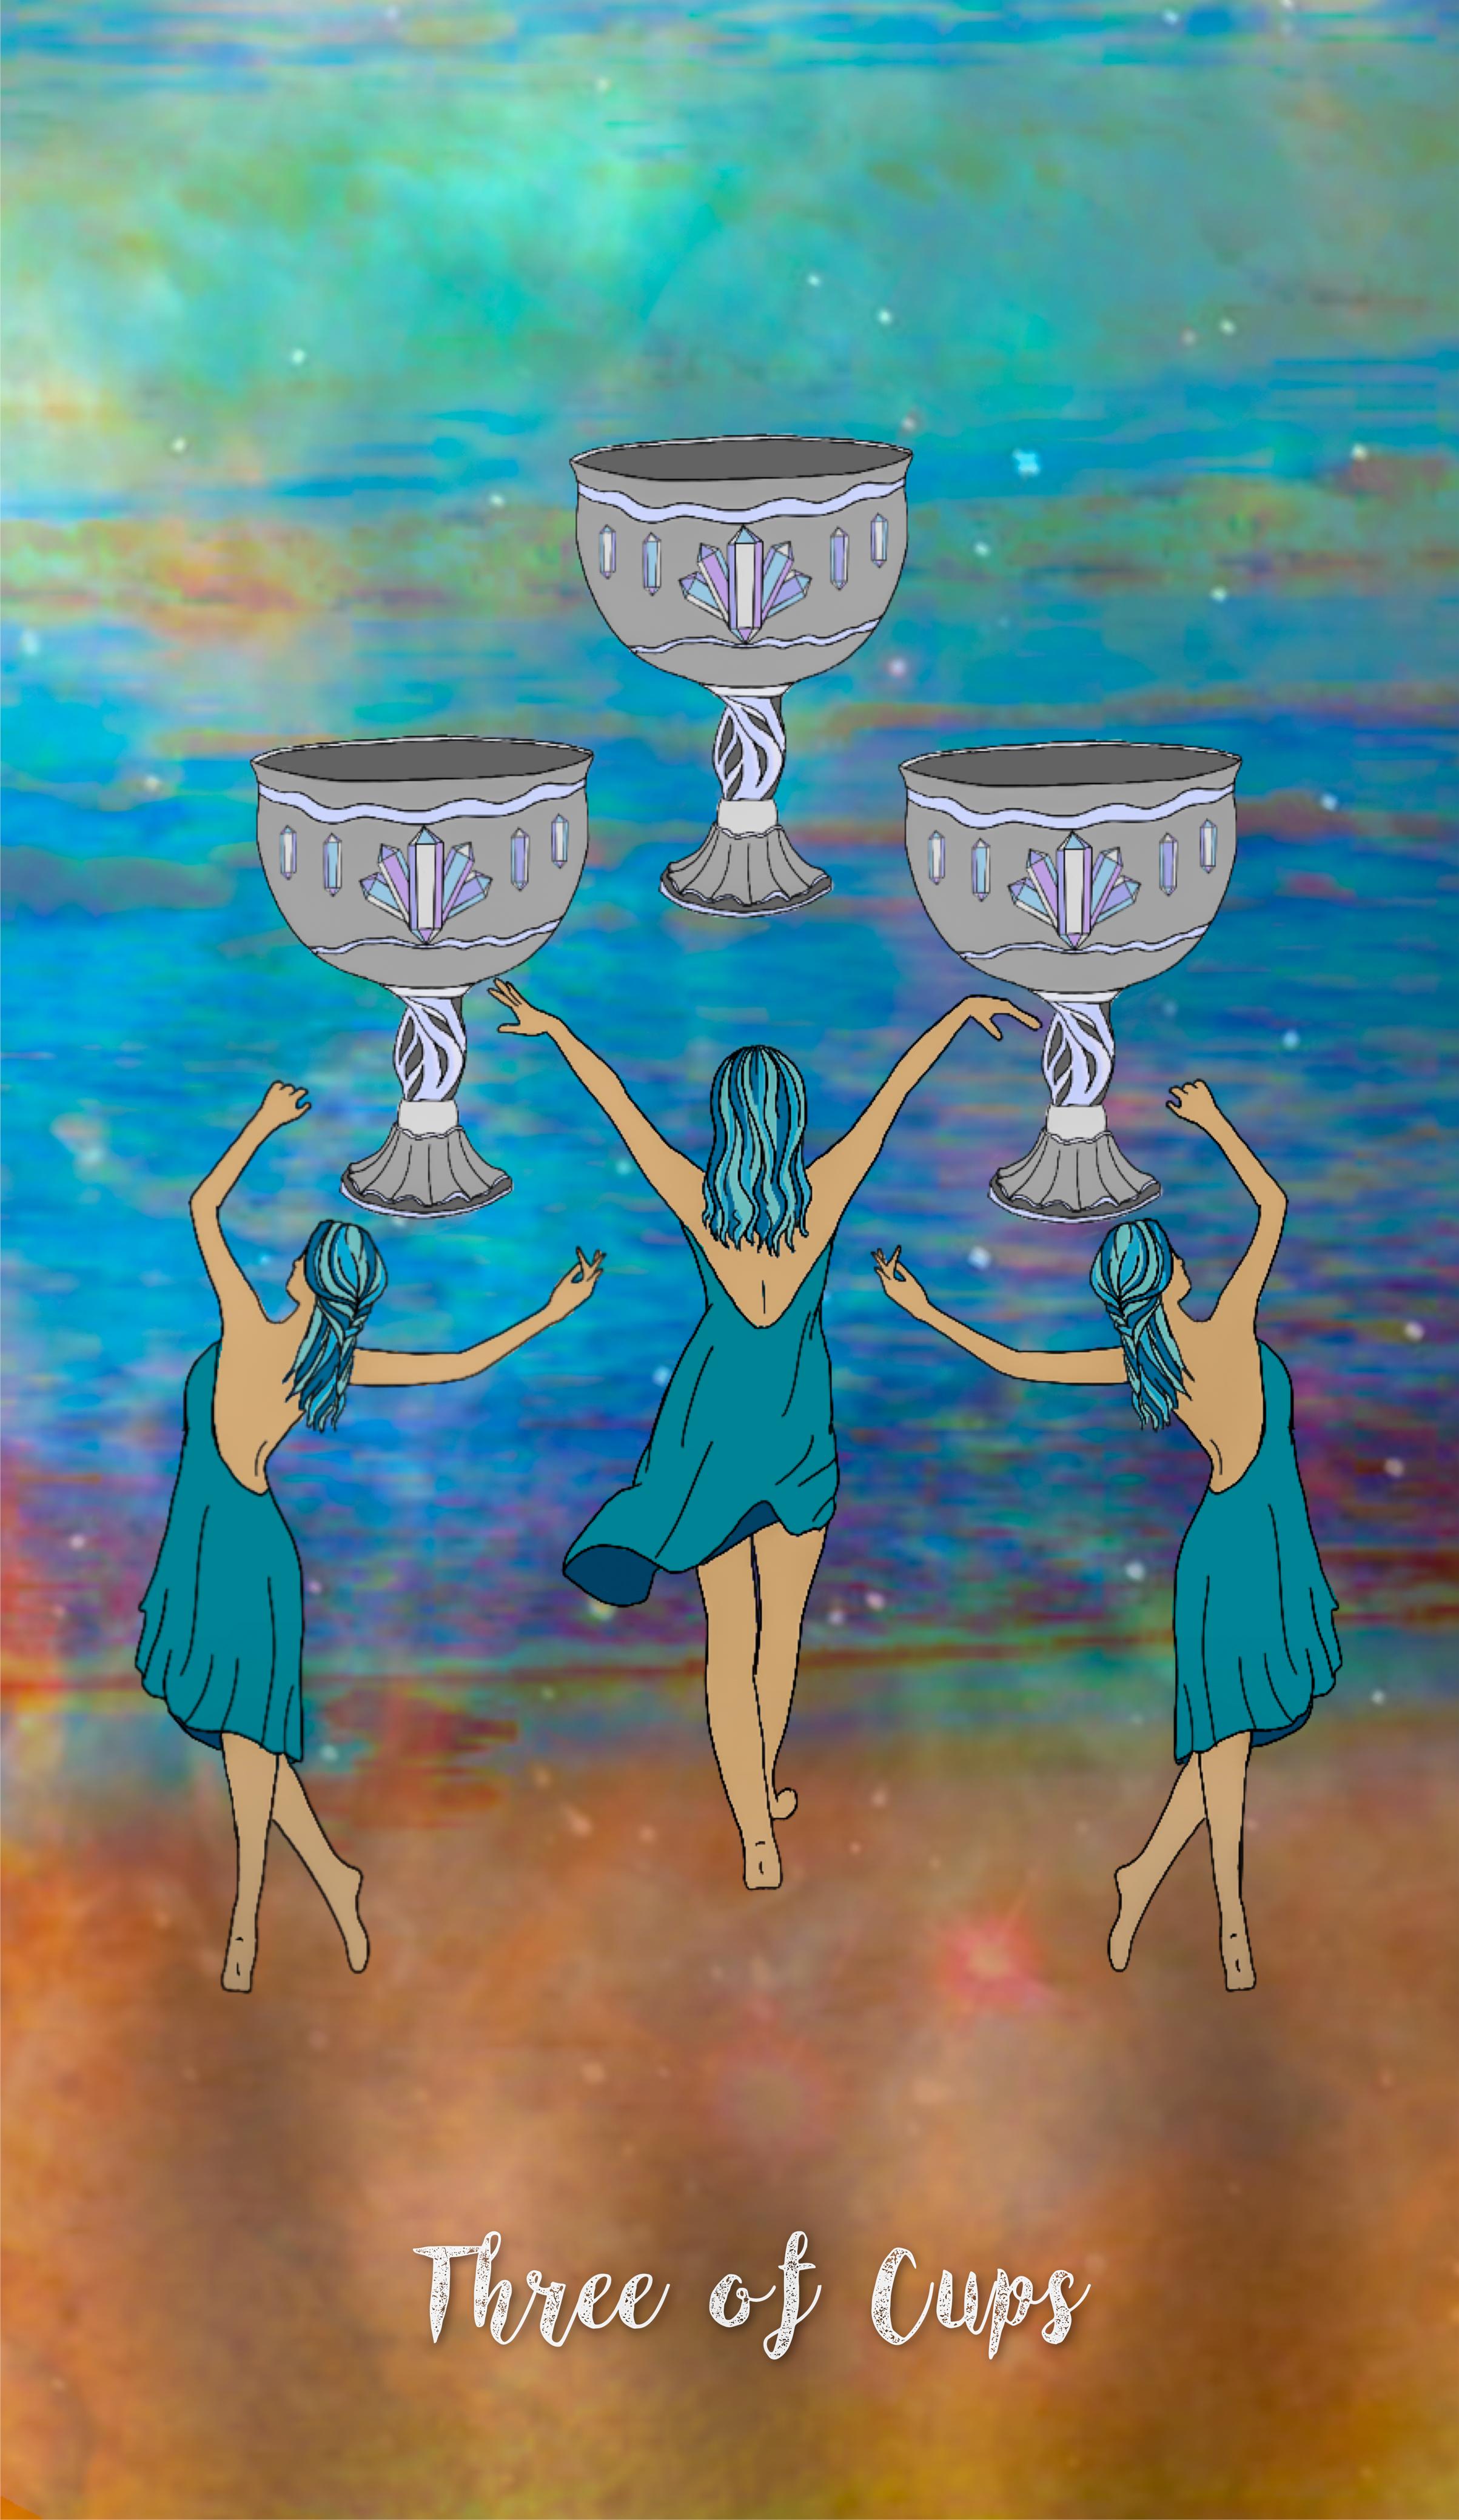 threeofcups.jpg